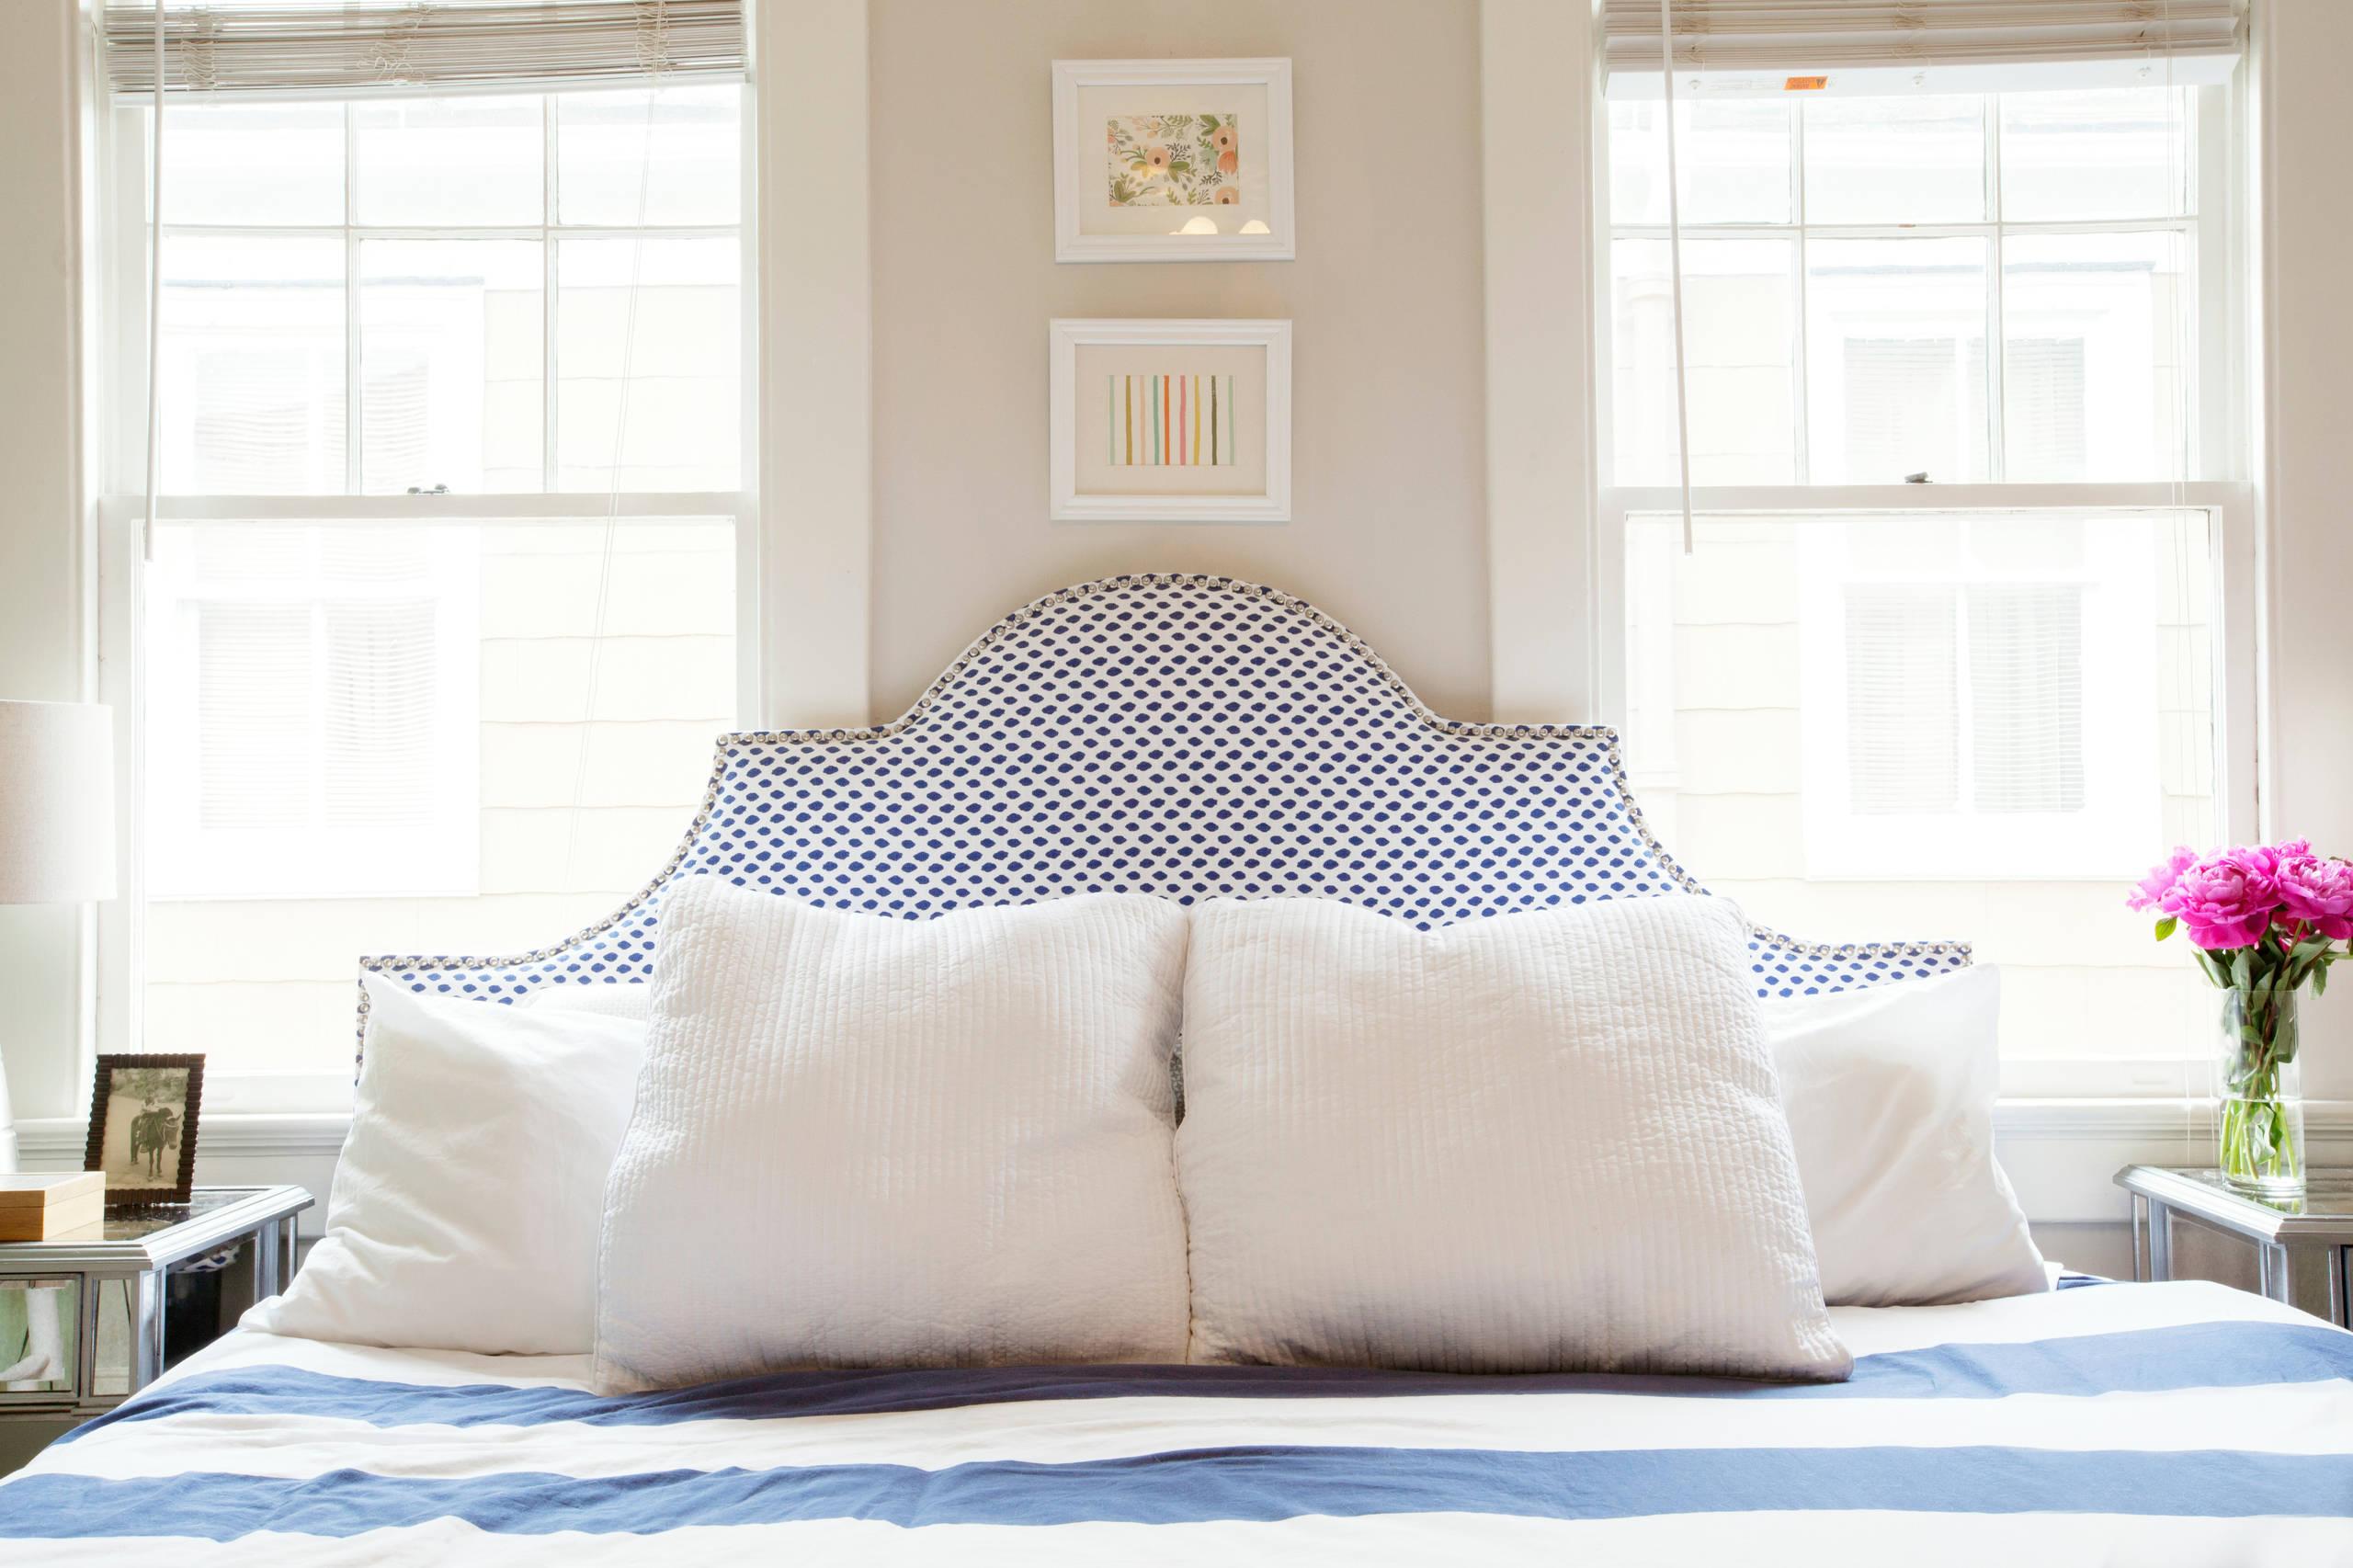 Preppy Bedroom Ideas And Photos Houzz